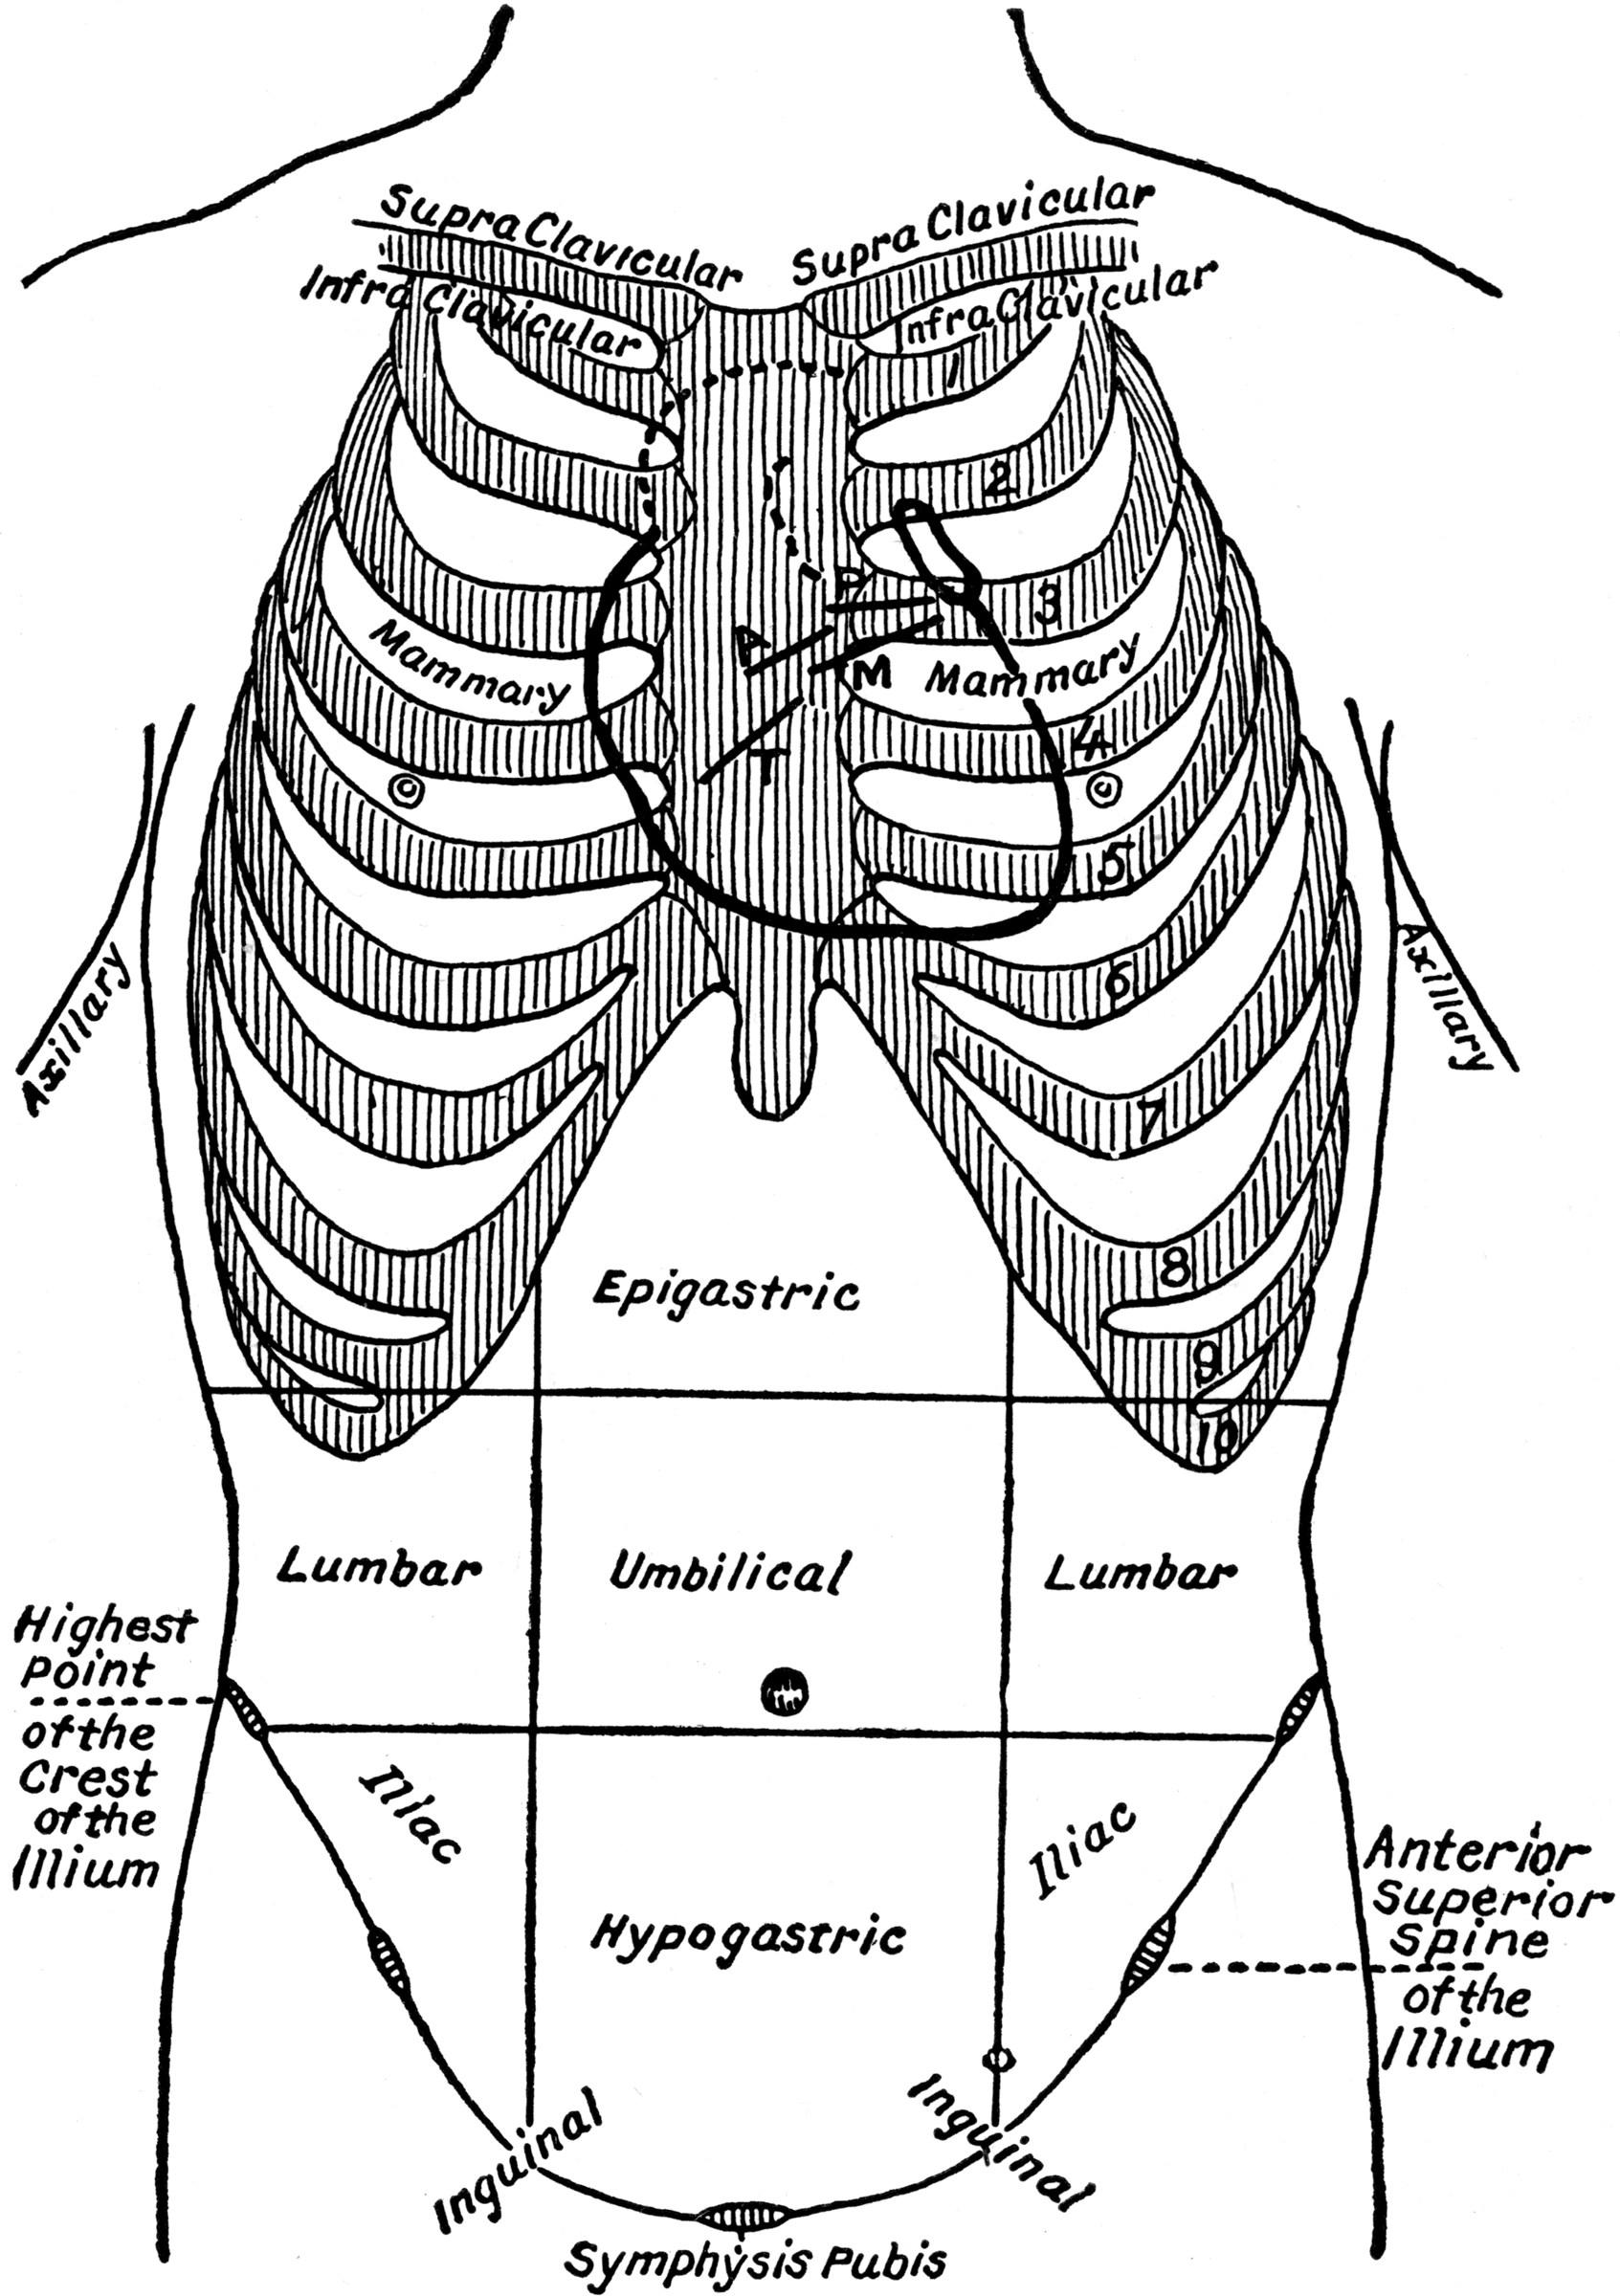 abdominal aorta diagram twist lock plug wiring thoracic and regions clipart etc